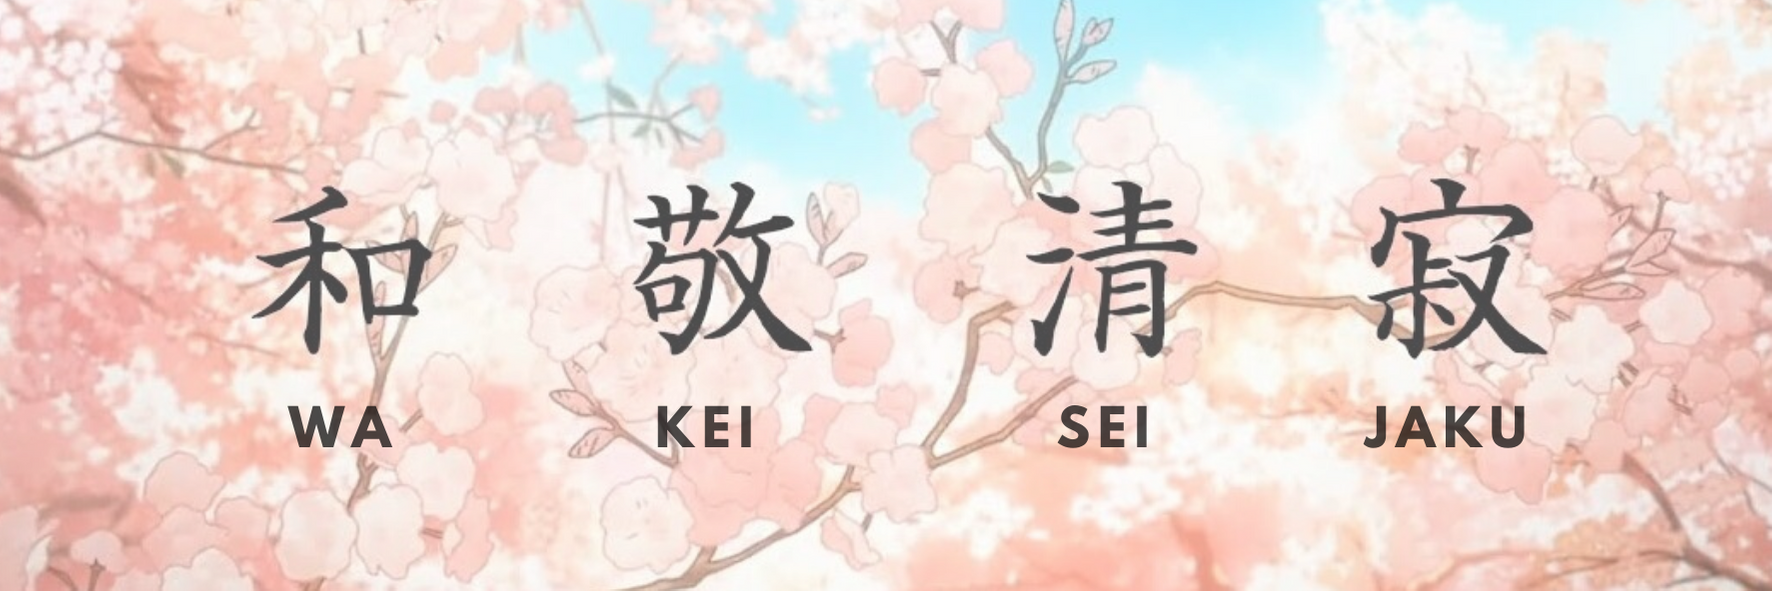 Wa Kei Sei Jaku - Valeurs Libéractrice